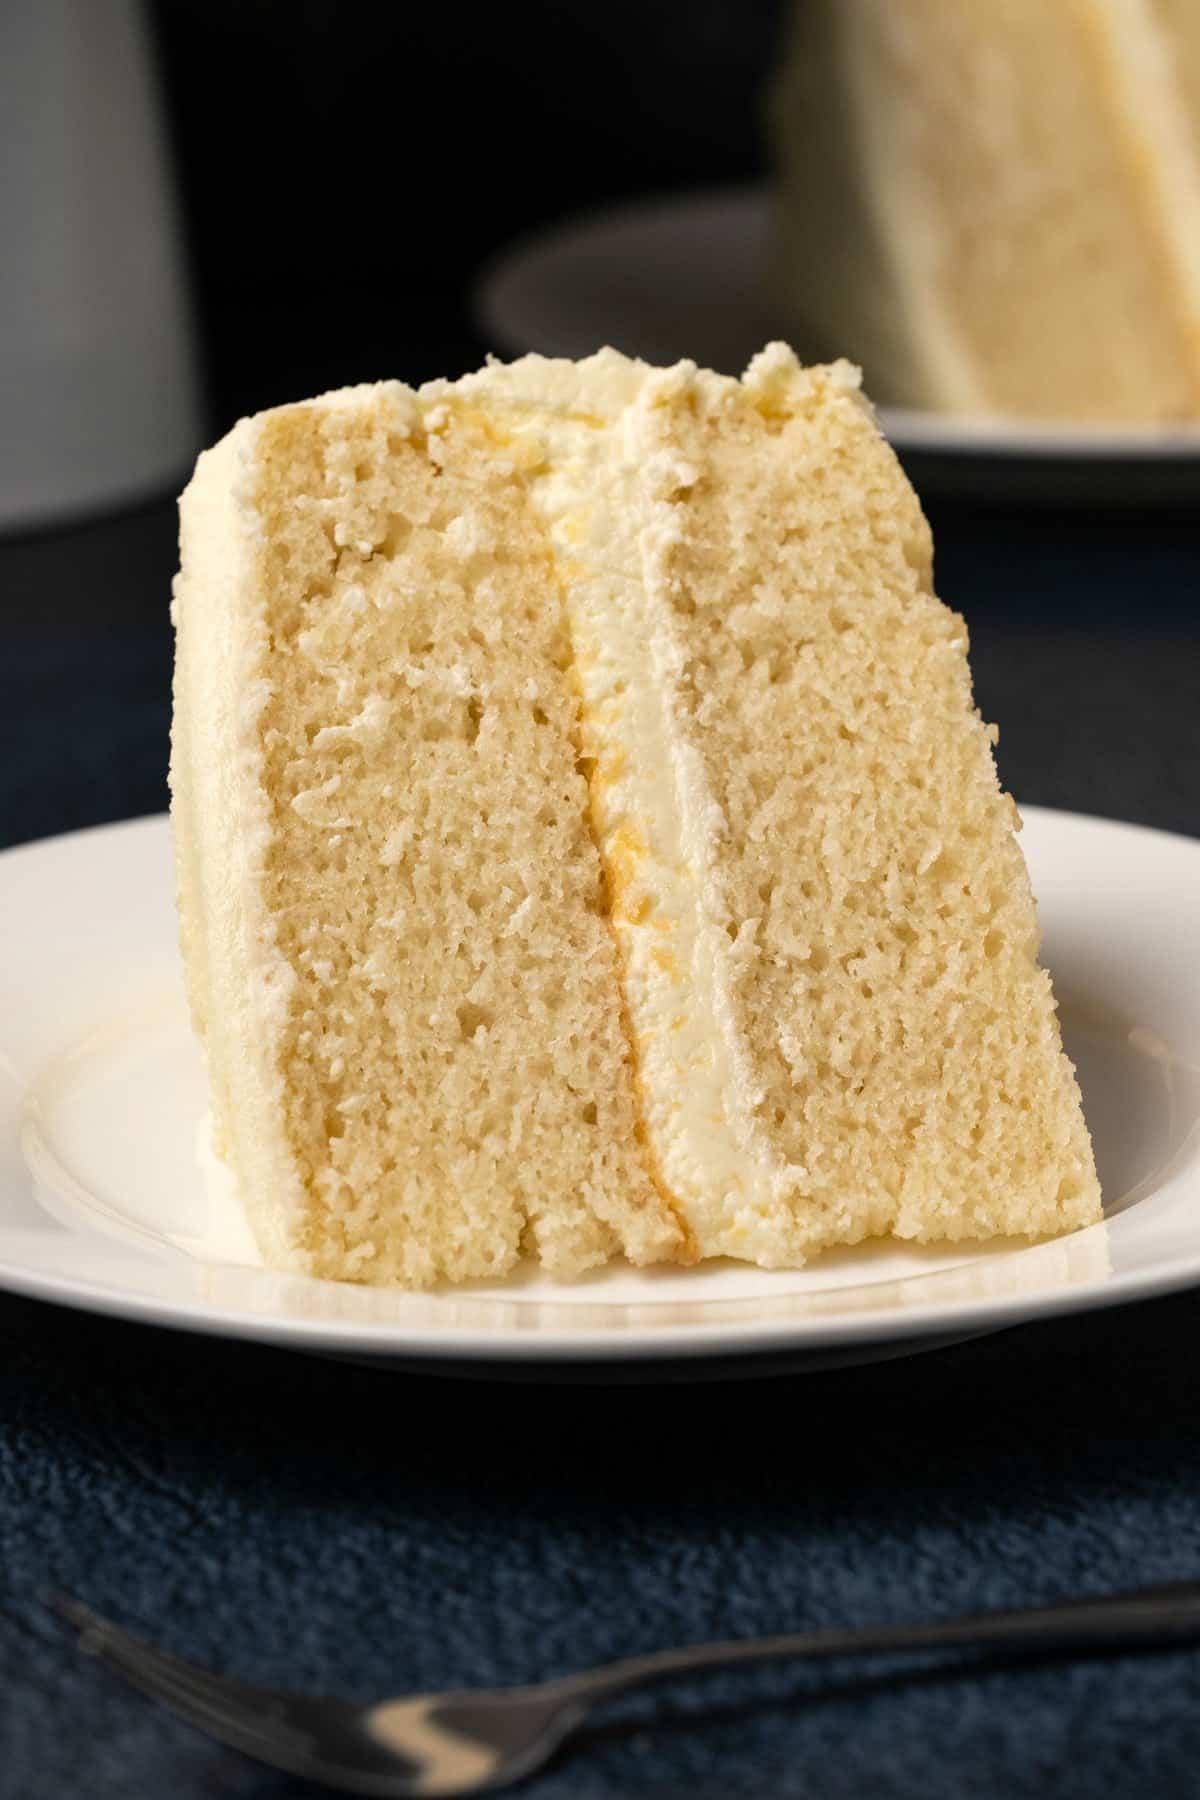 Slice of vegan white cake on a white plate.